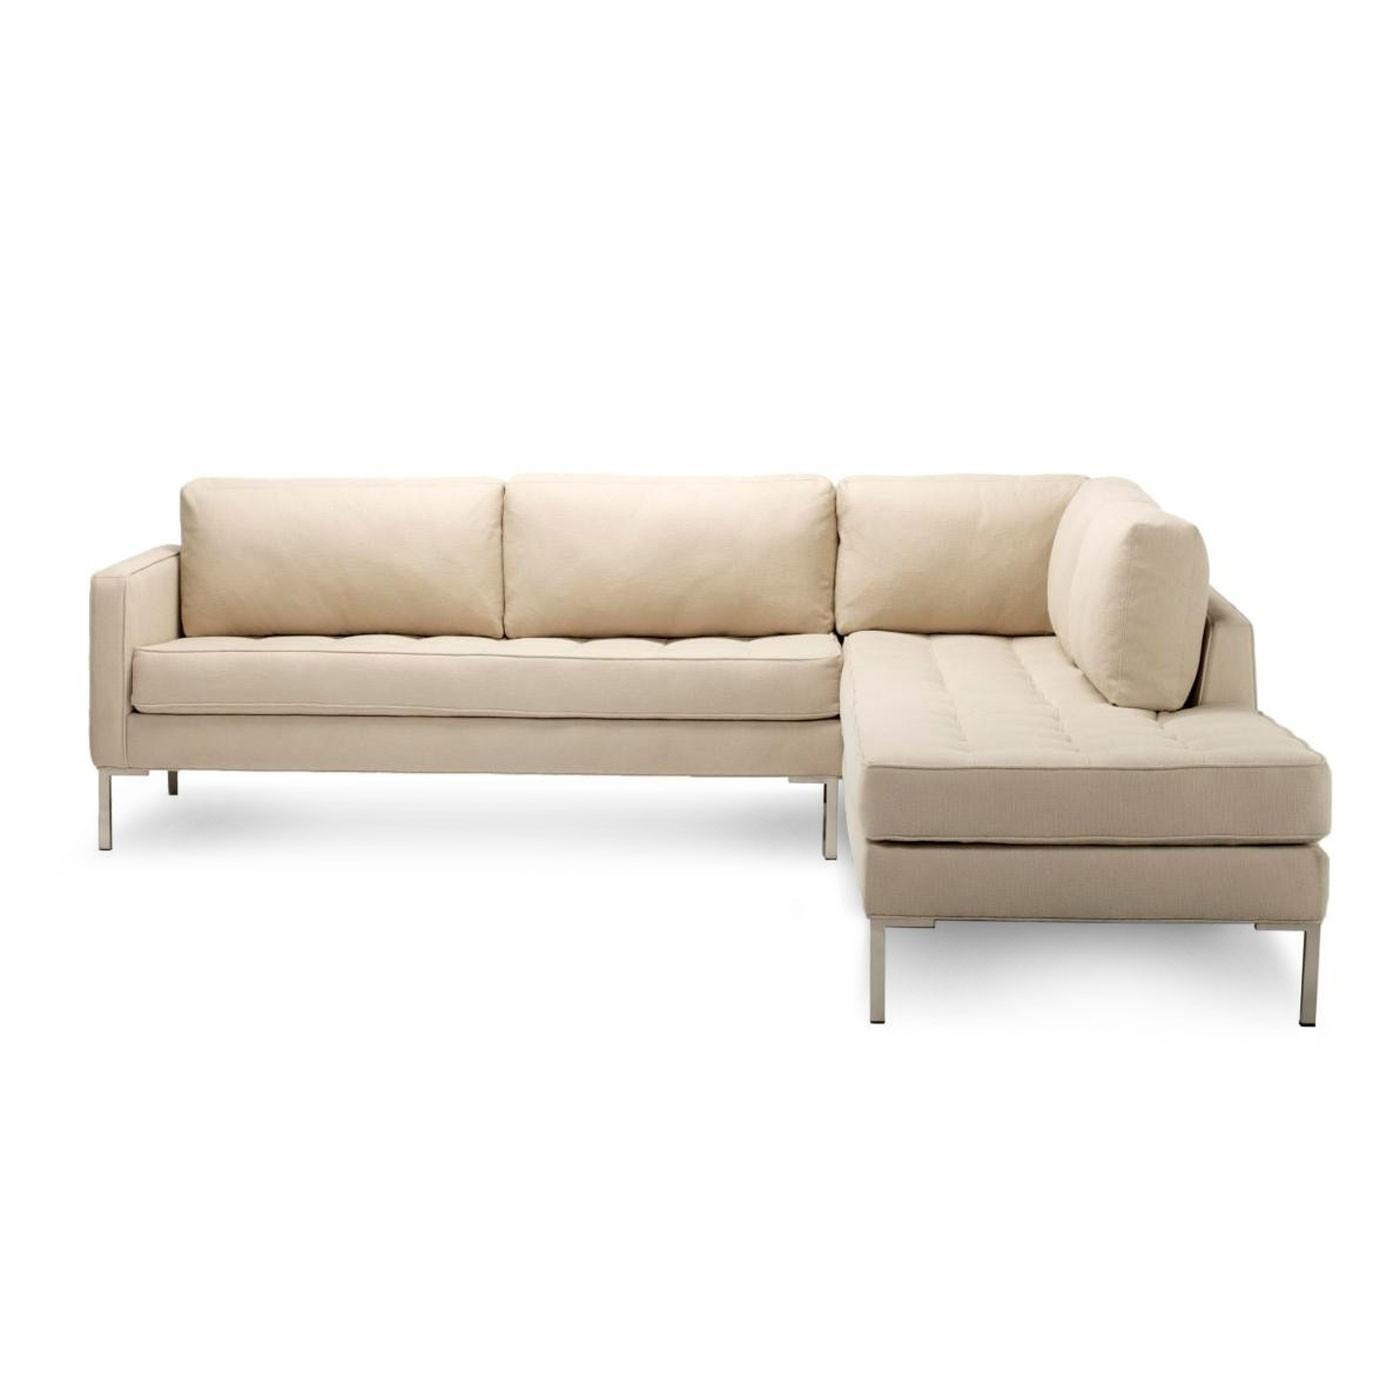 Furniture: Sofa For Sale | Armless Sofas | Armless Settee Regarding Armless Sectional Sofas (View 14 of 15)